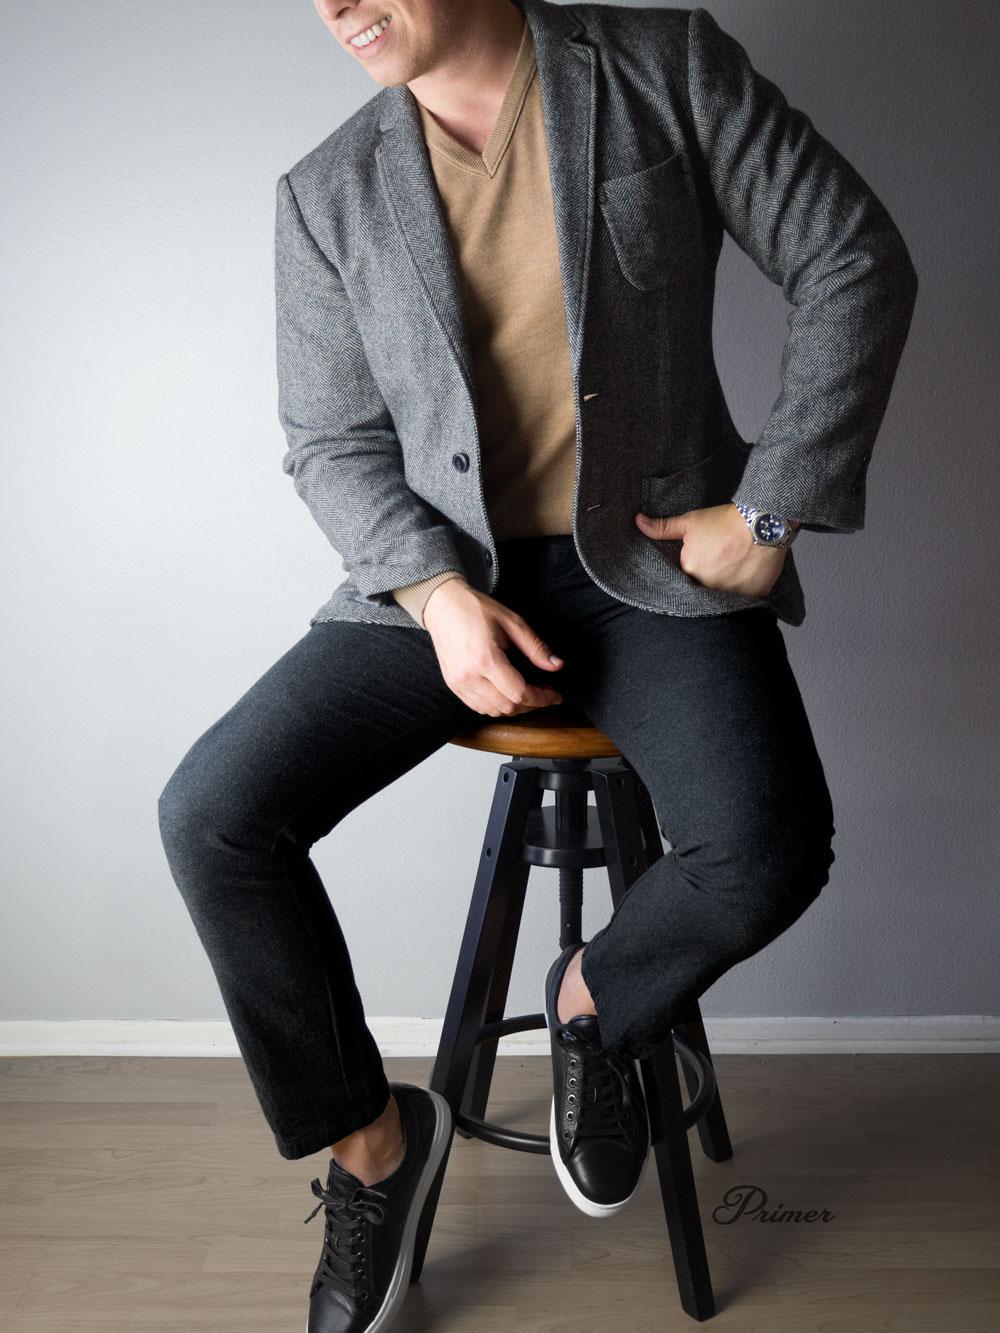 Cocktail bar men's fall fashion inspiration